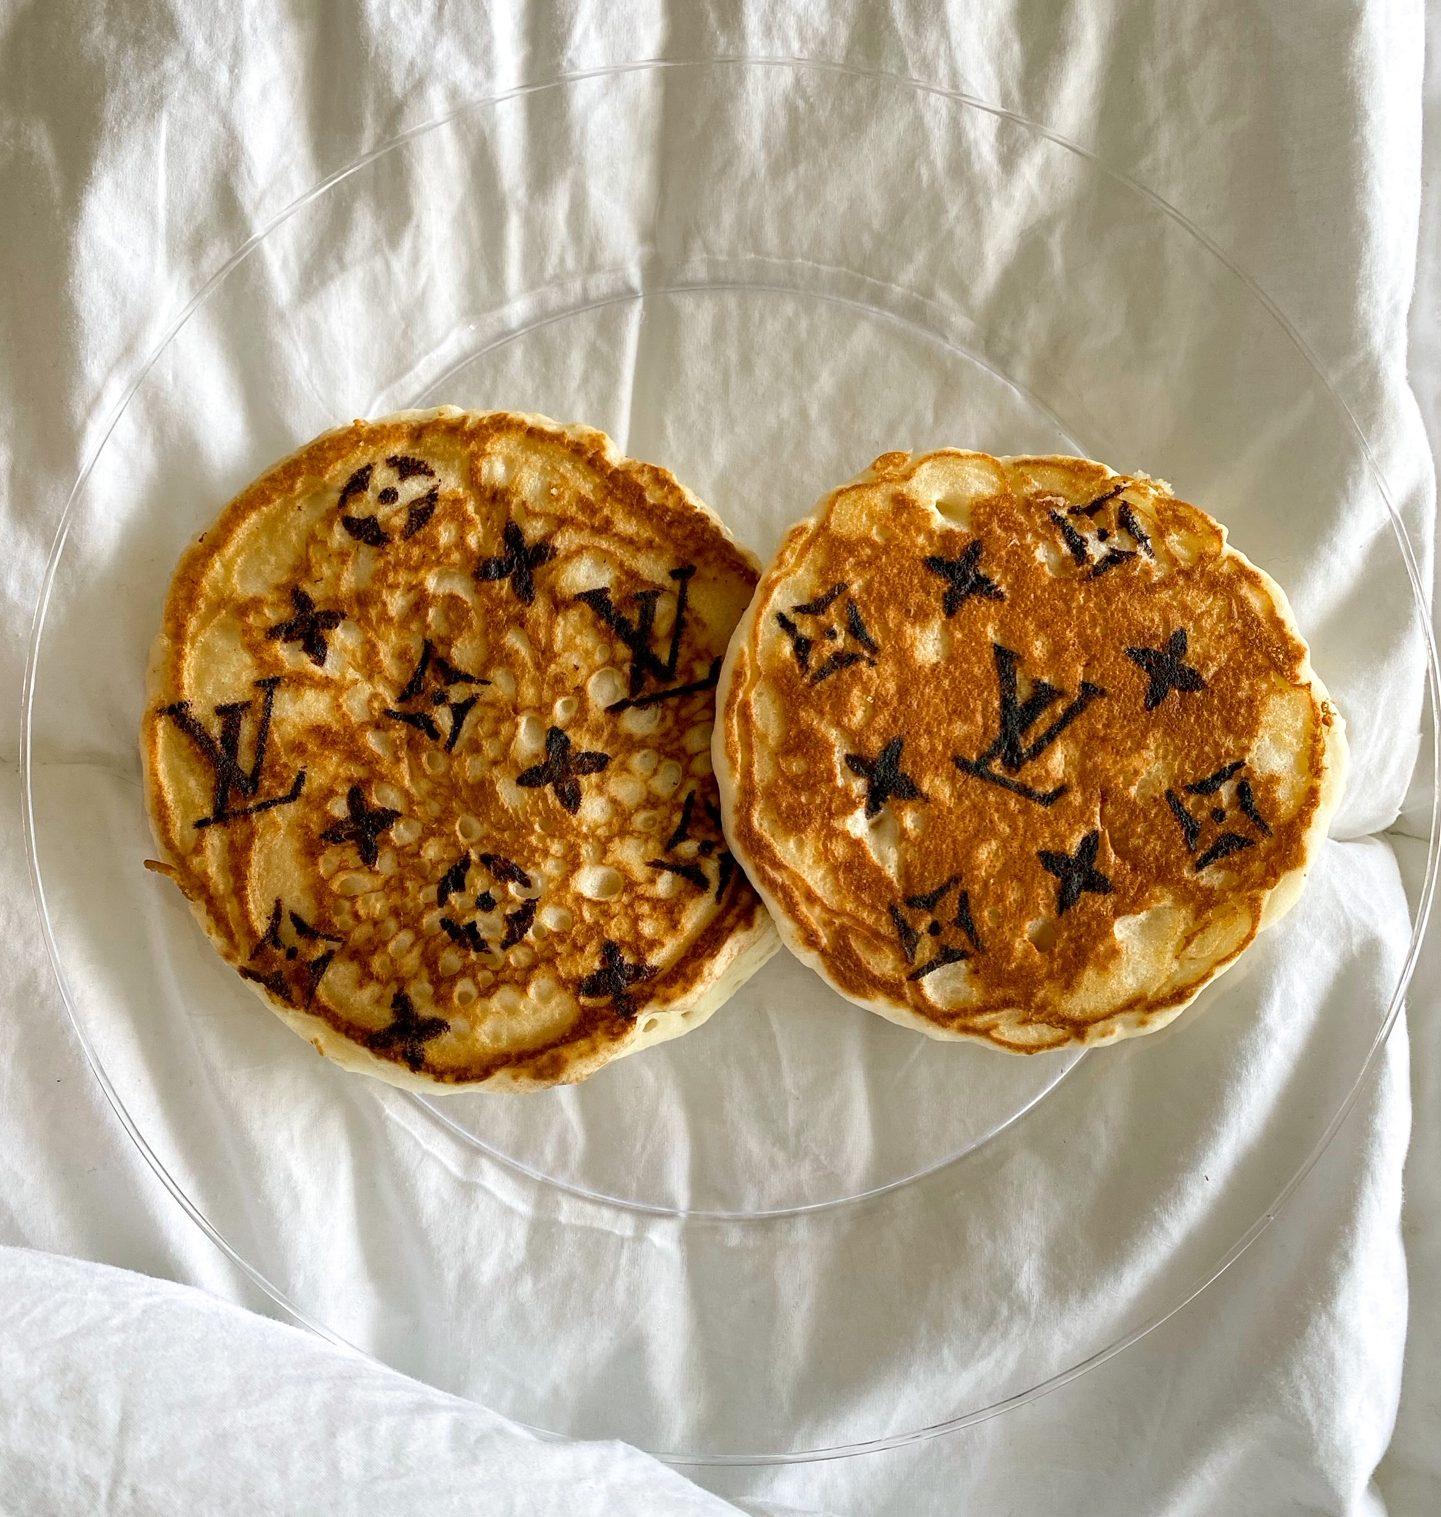 Louis Vuitton Pancakes - beyond casual b